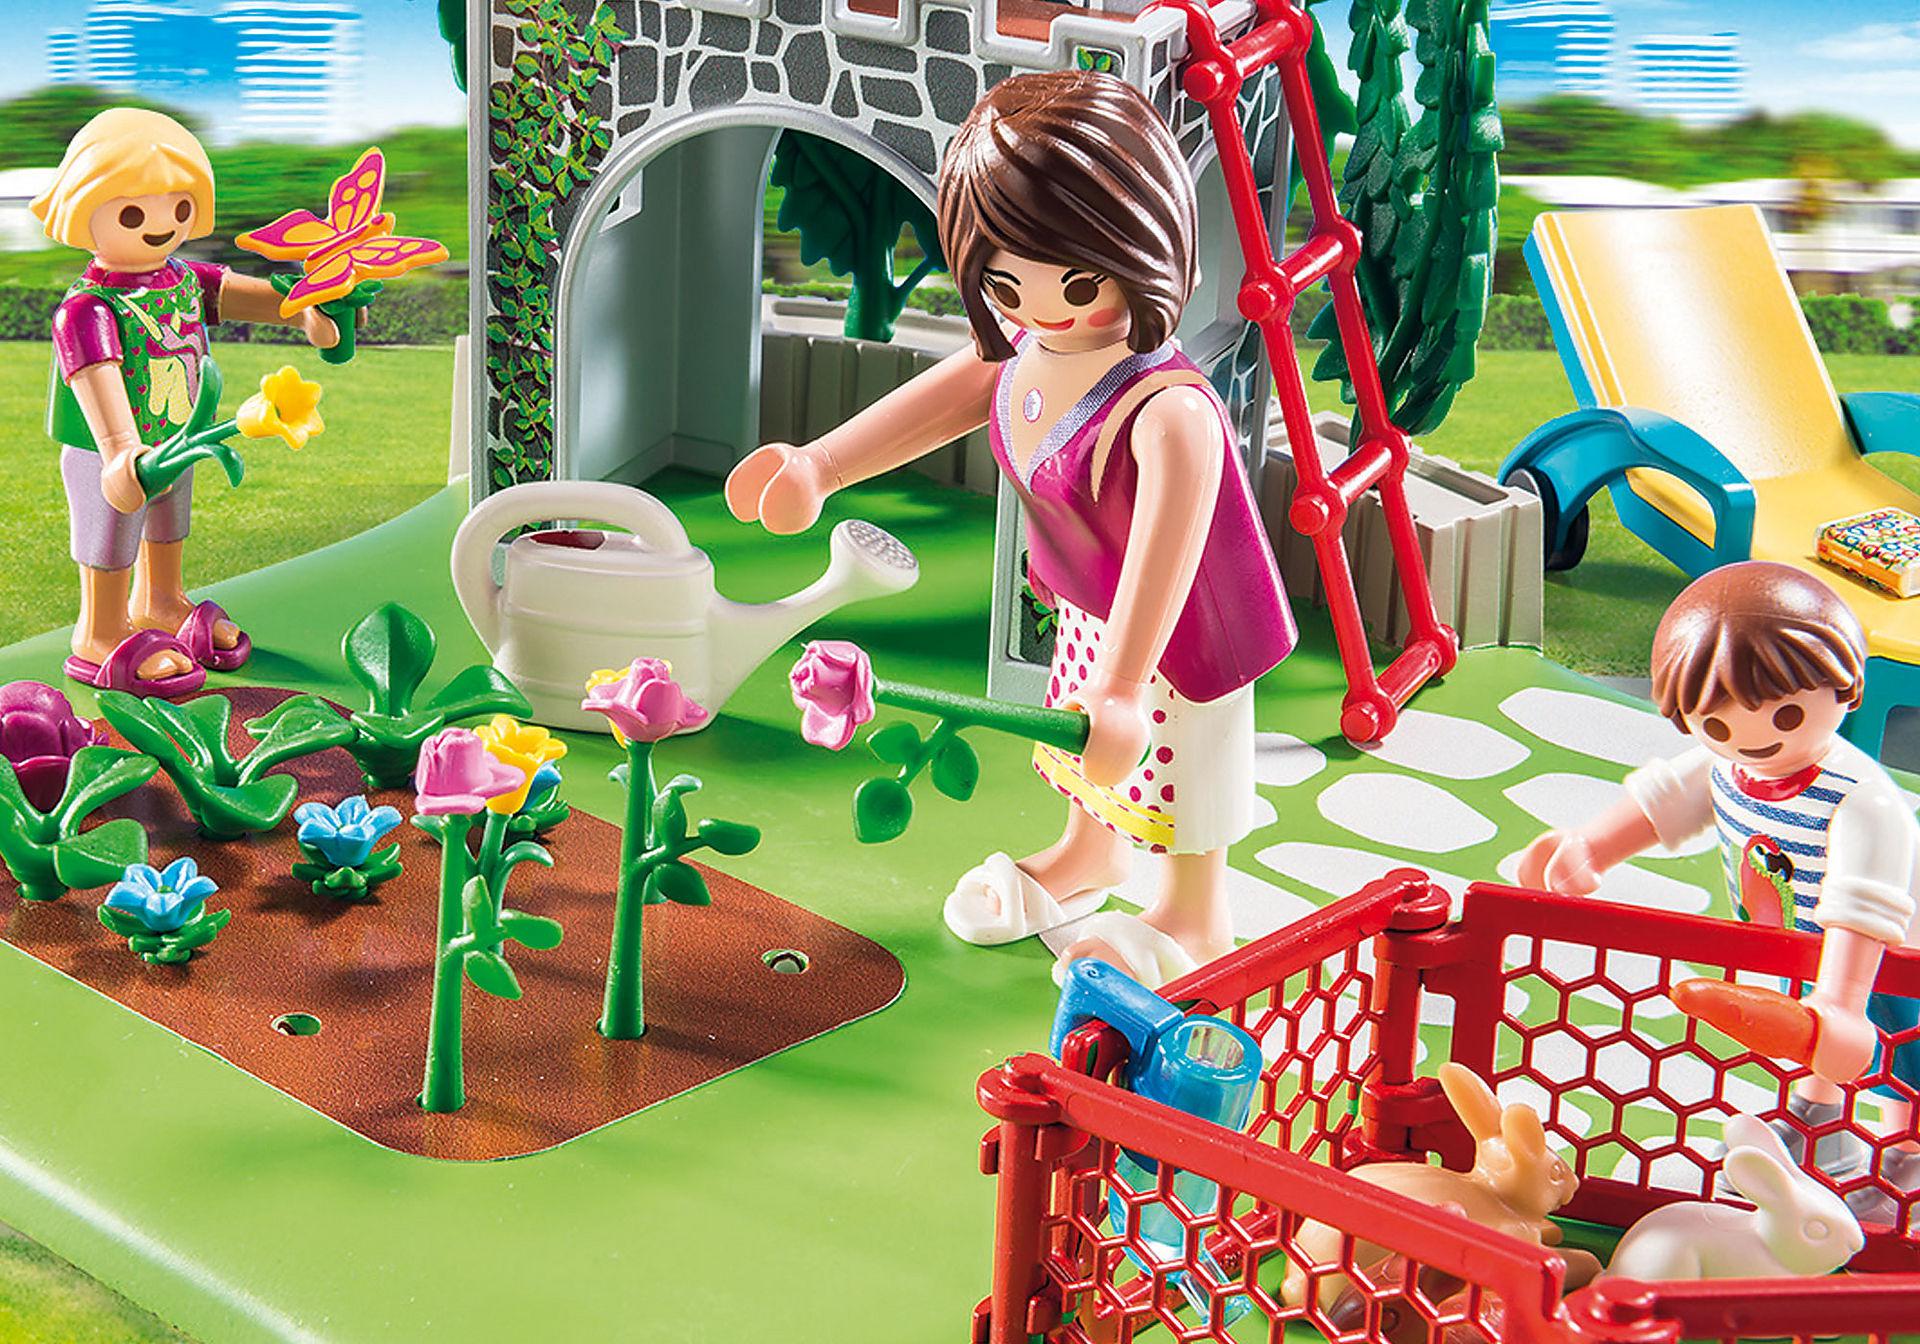 http://media.playmobil.com/i/playmobil/70010_product_extra1/SuperSet Famille et jardin